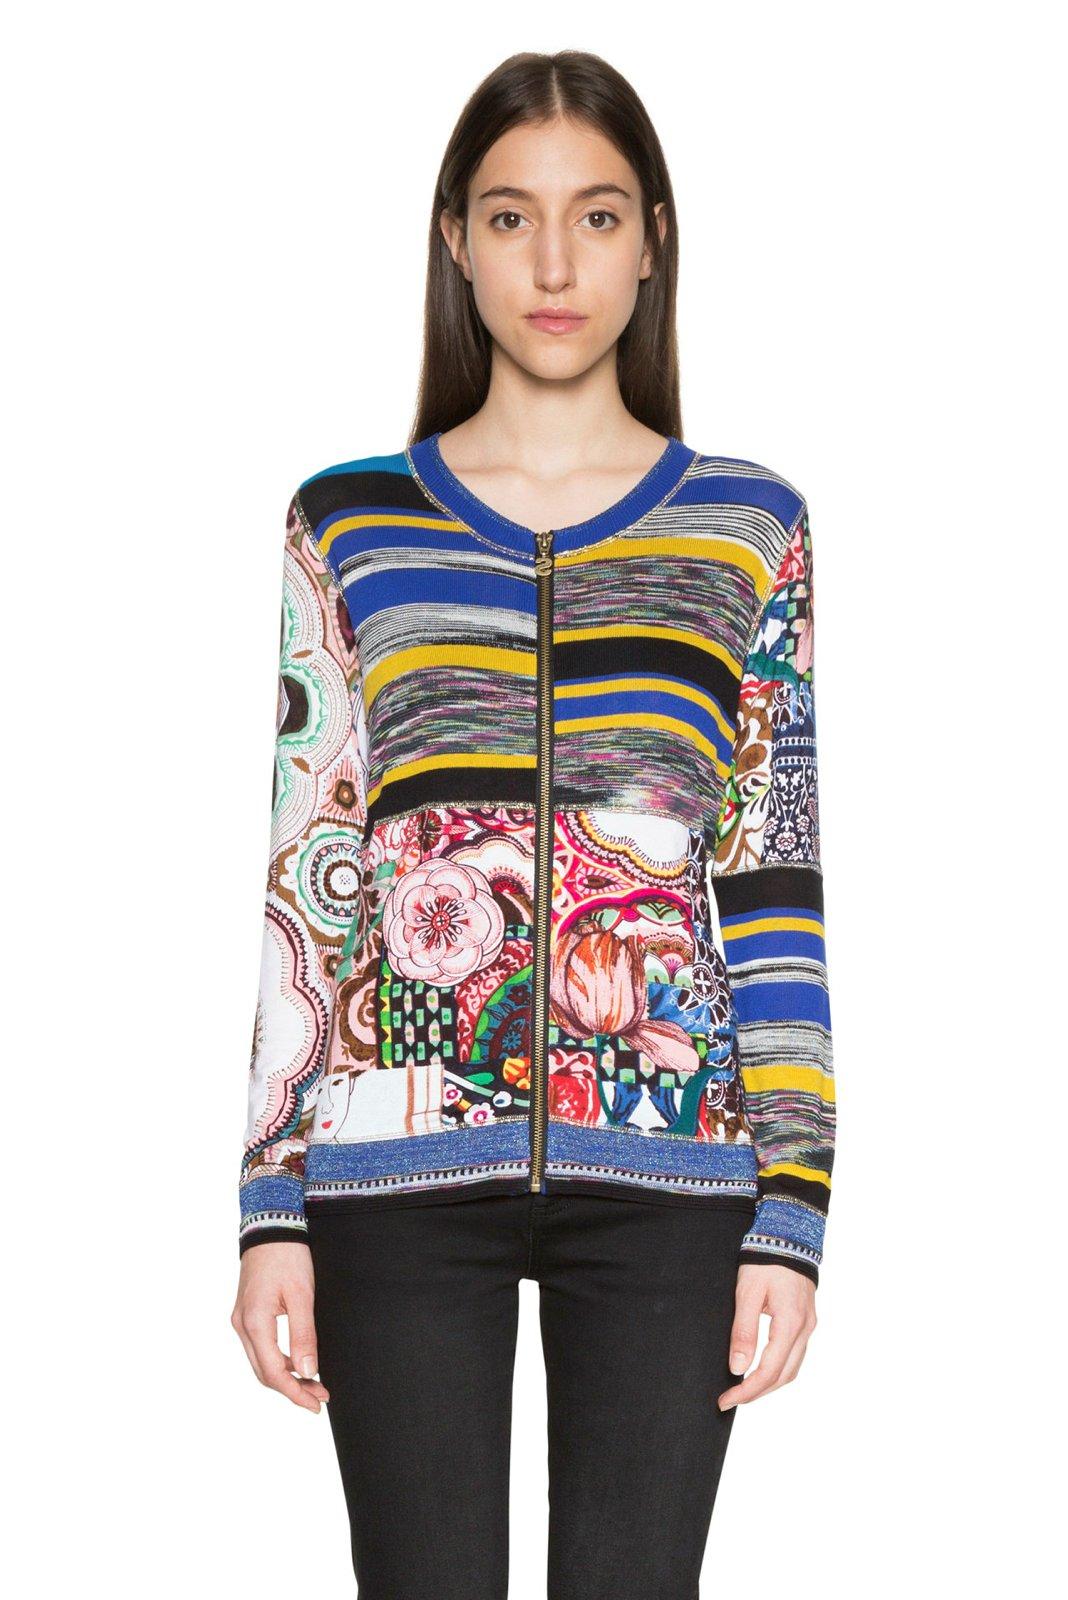 Desigual Women's A Fine Balance Zip Up Cardigan XS/UK 8